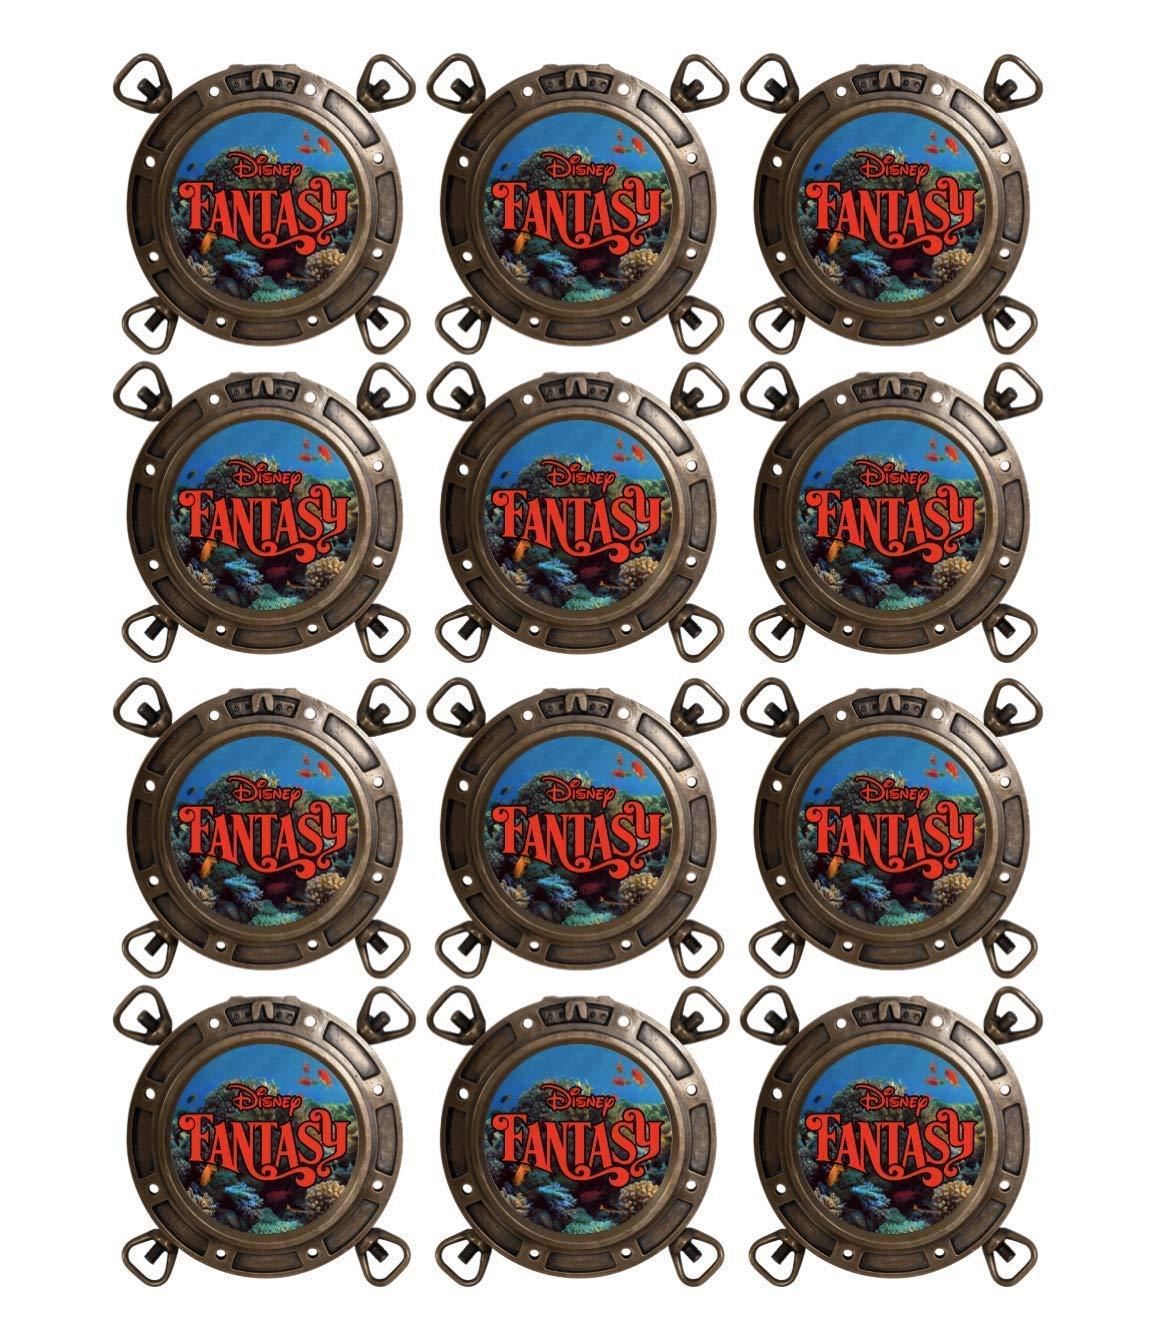 FE Disney Dream DCL Porthole Gift Magnets Magic Wonder Gift FREE SHIPPING | Fantasy 12 Fish Extender Gifts 12 Disney Cruise Gift Magnets